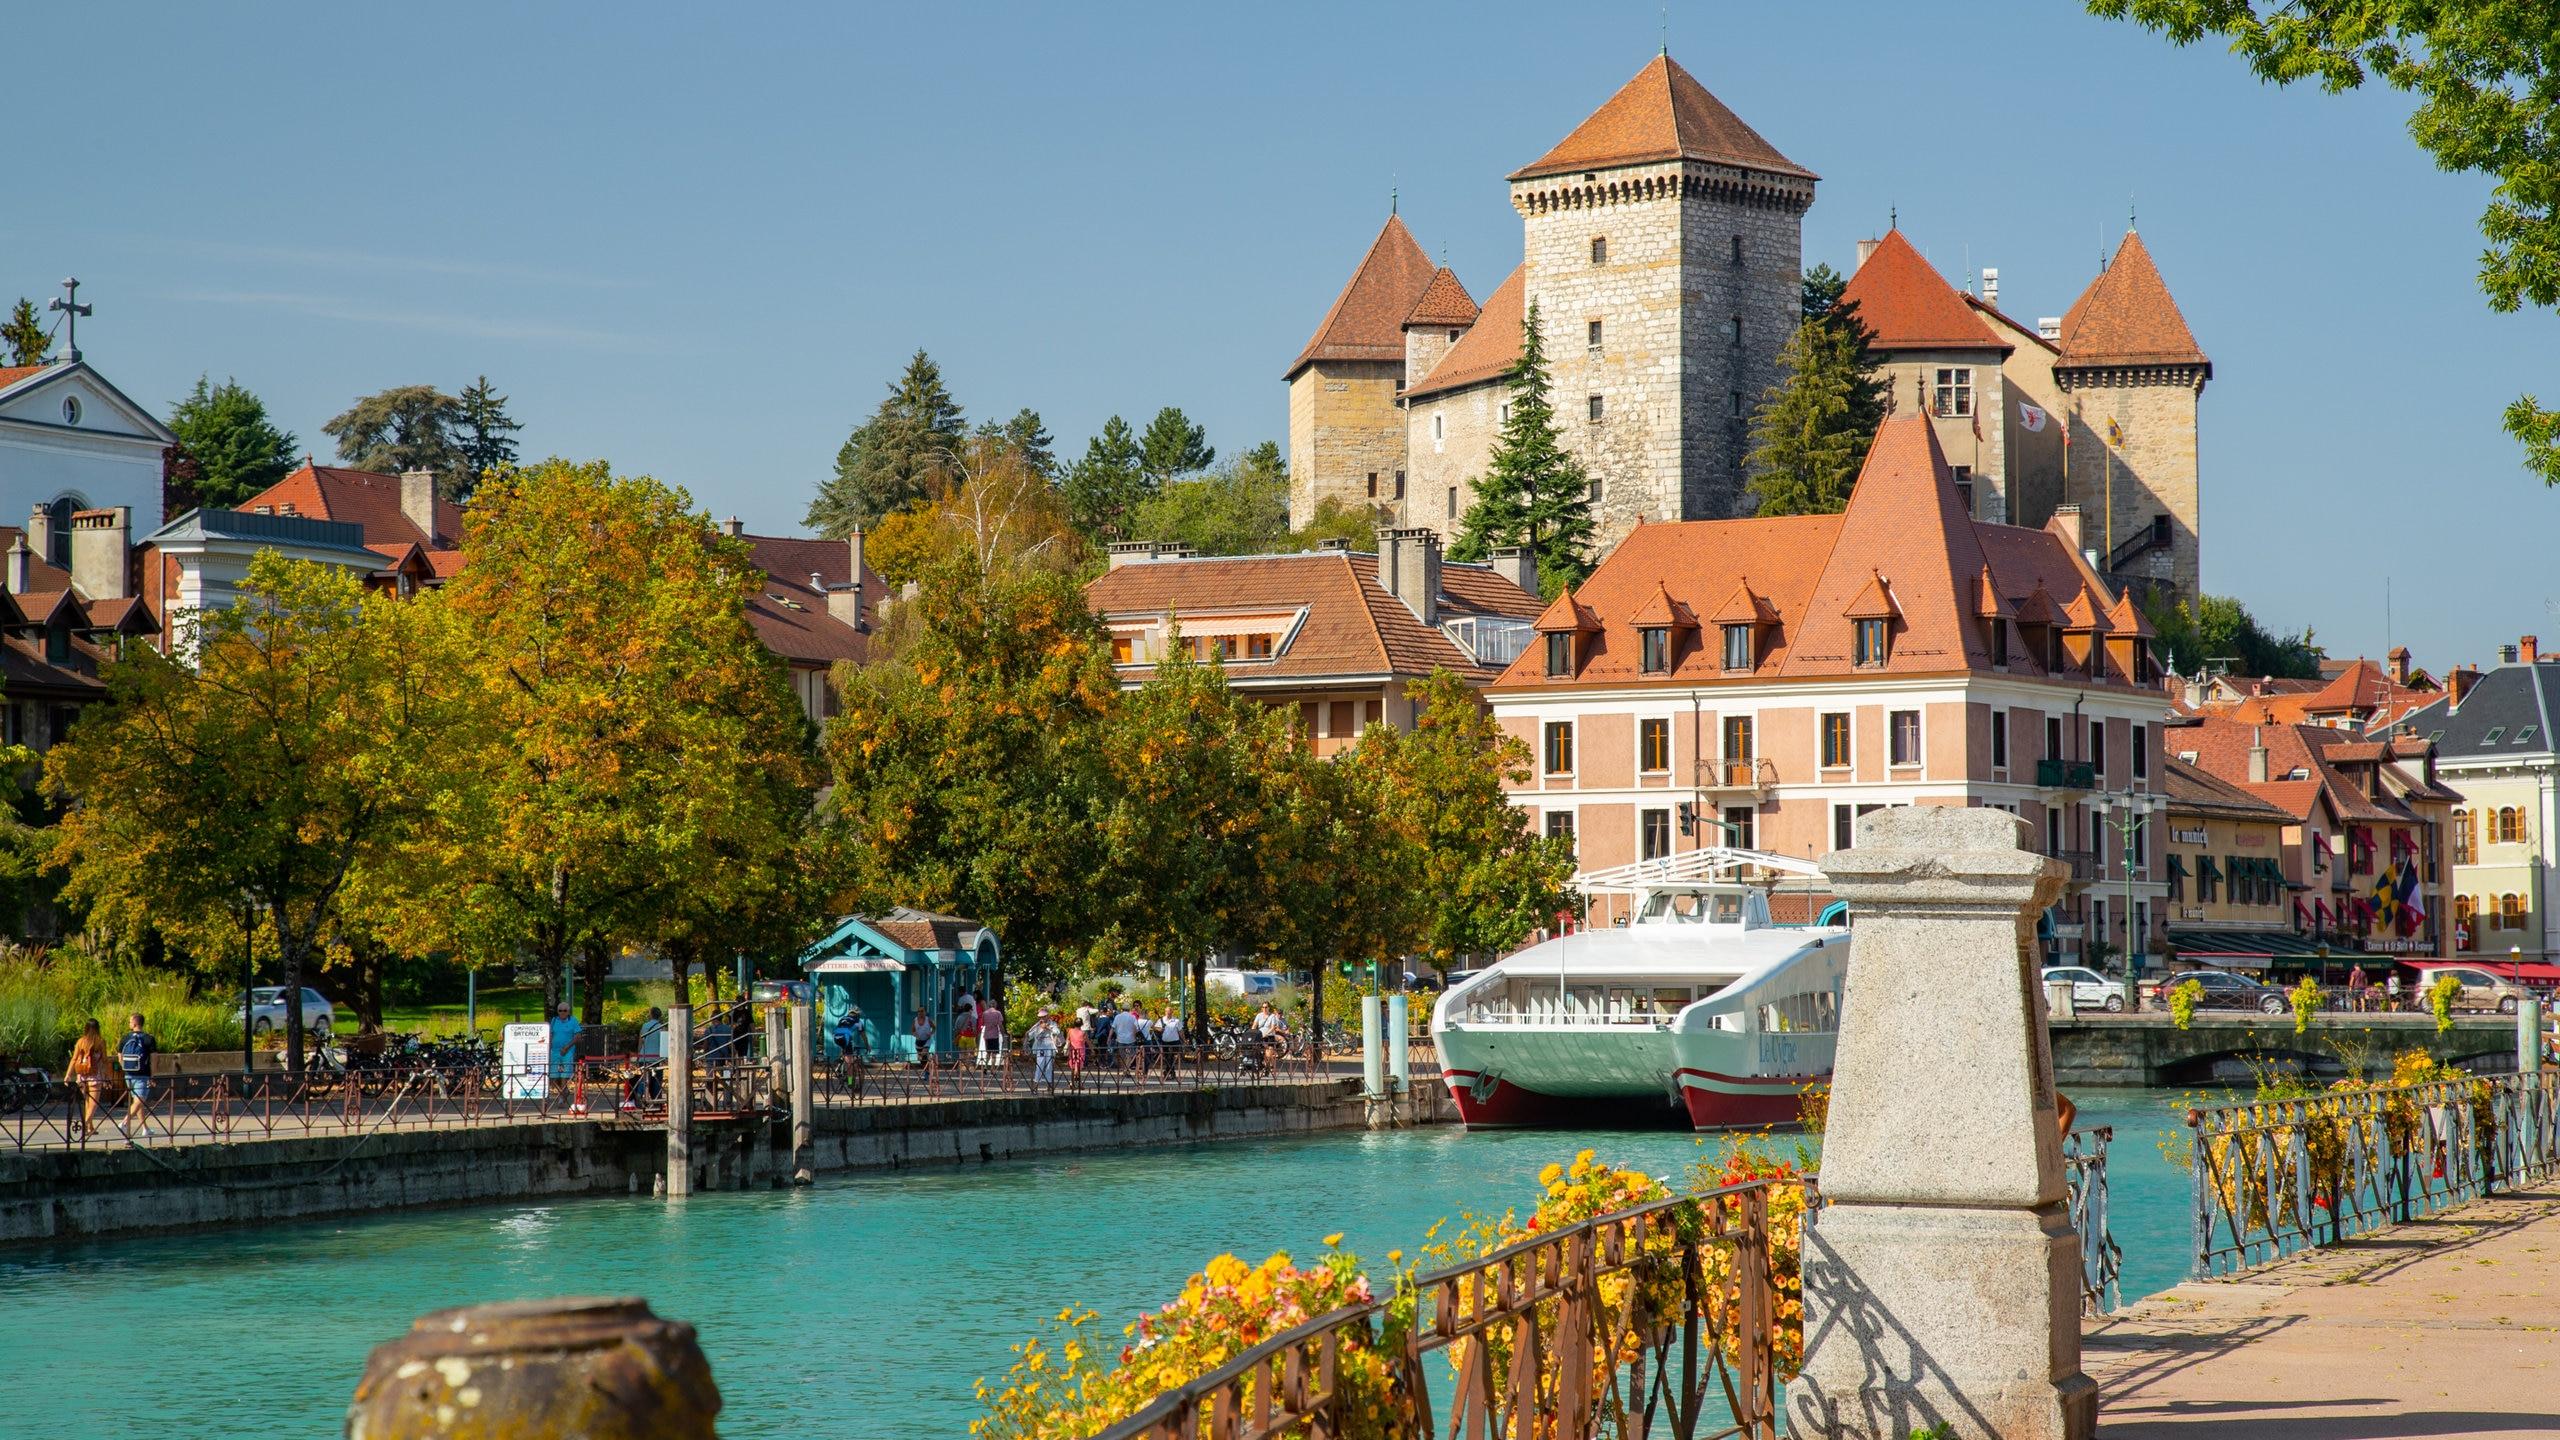 Annecy Castle, Annecy, Haute-Savoie, France